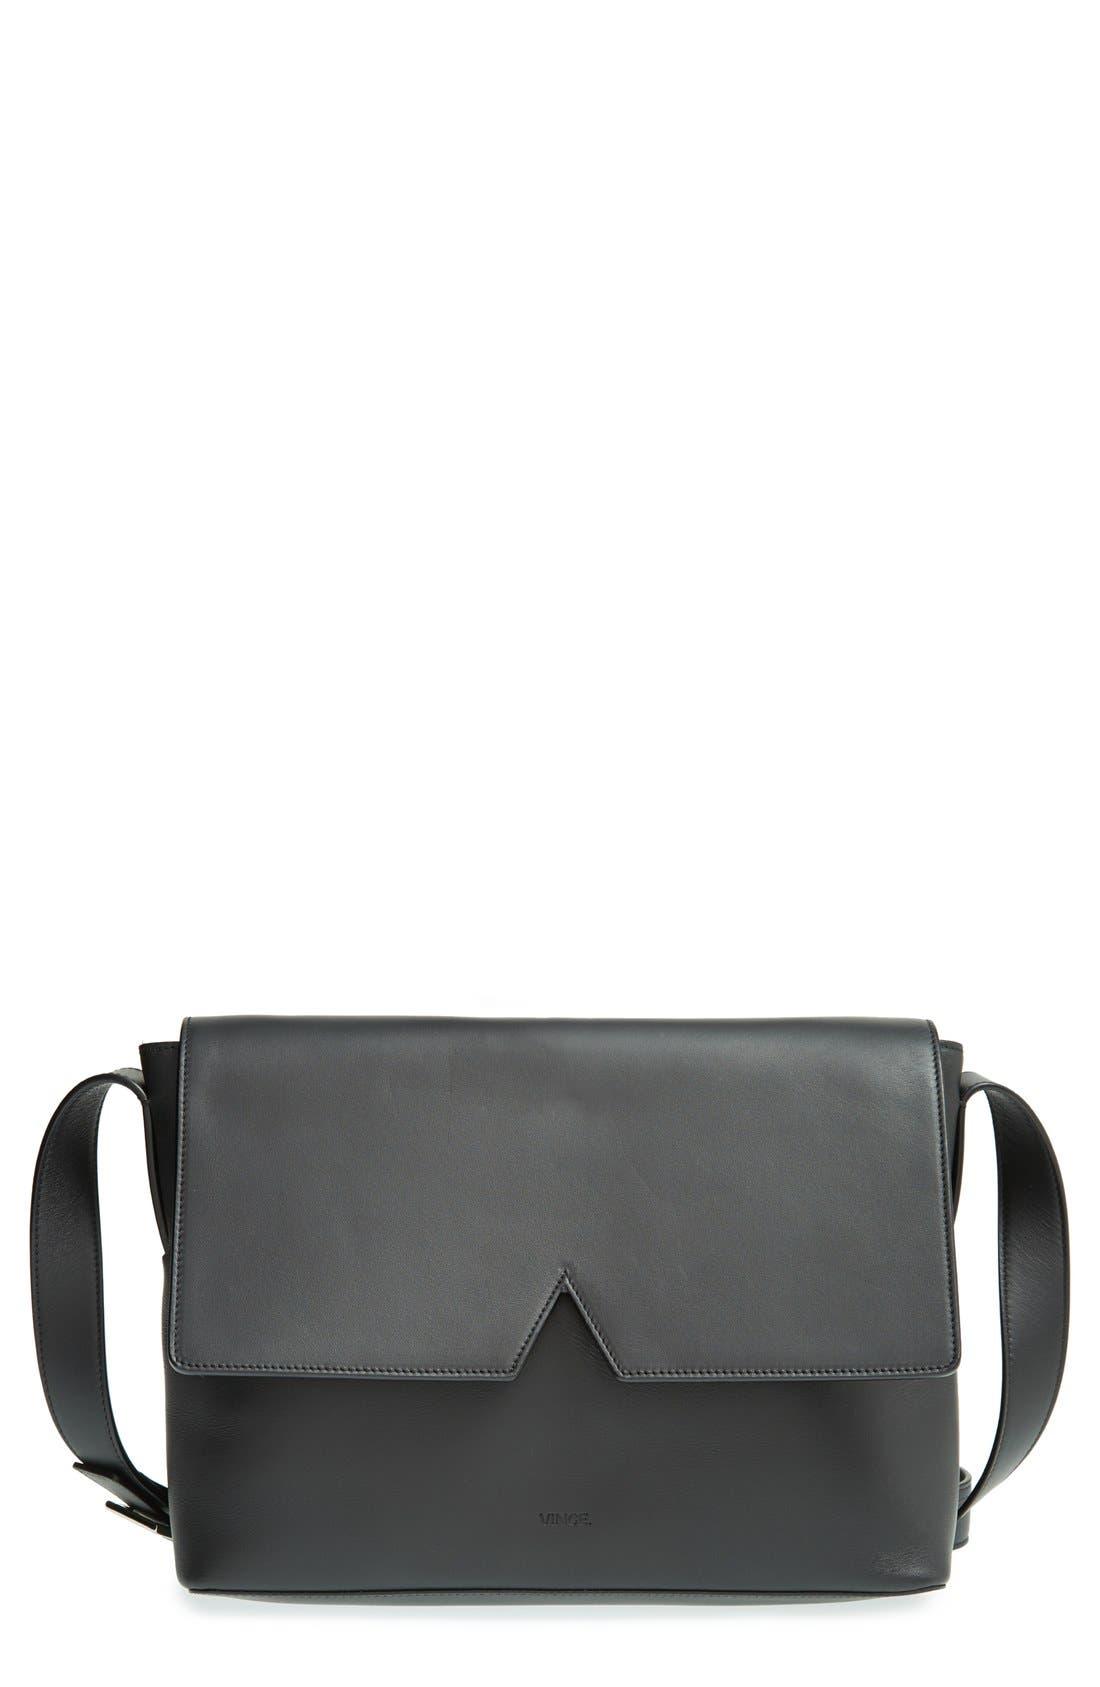 'Signature Collection - Medium' Leather Messenger Bag,                             Main thumbnail 1, color,                             001